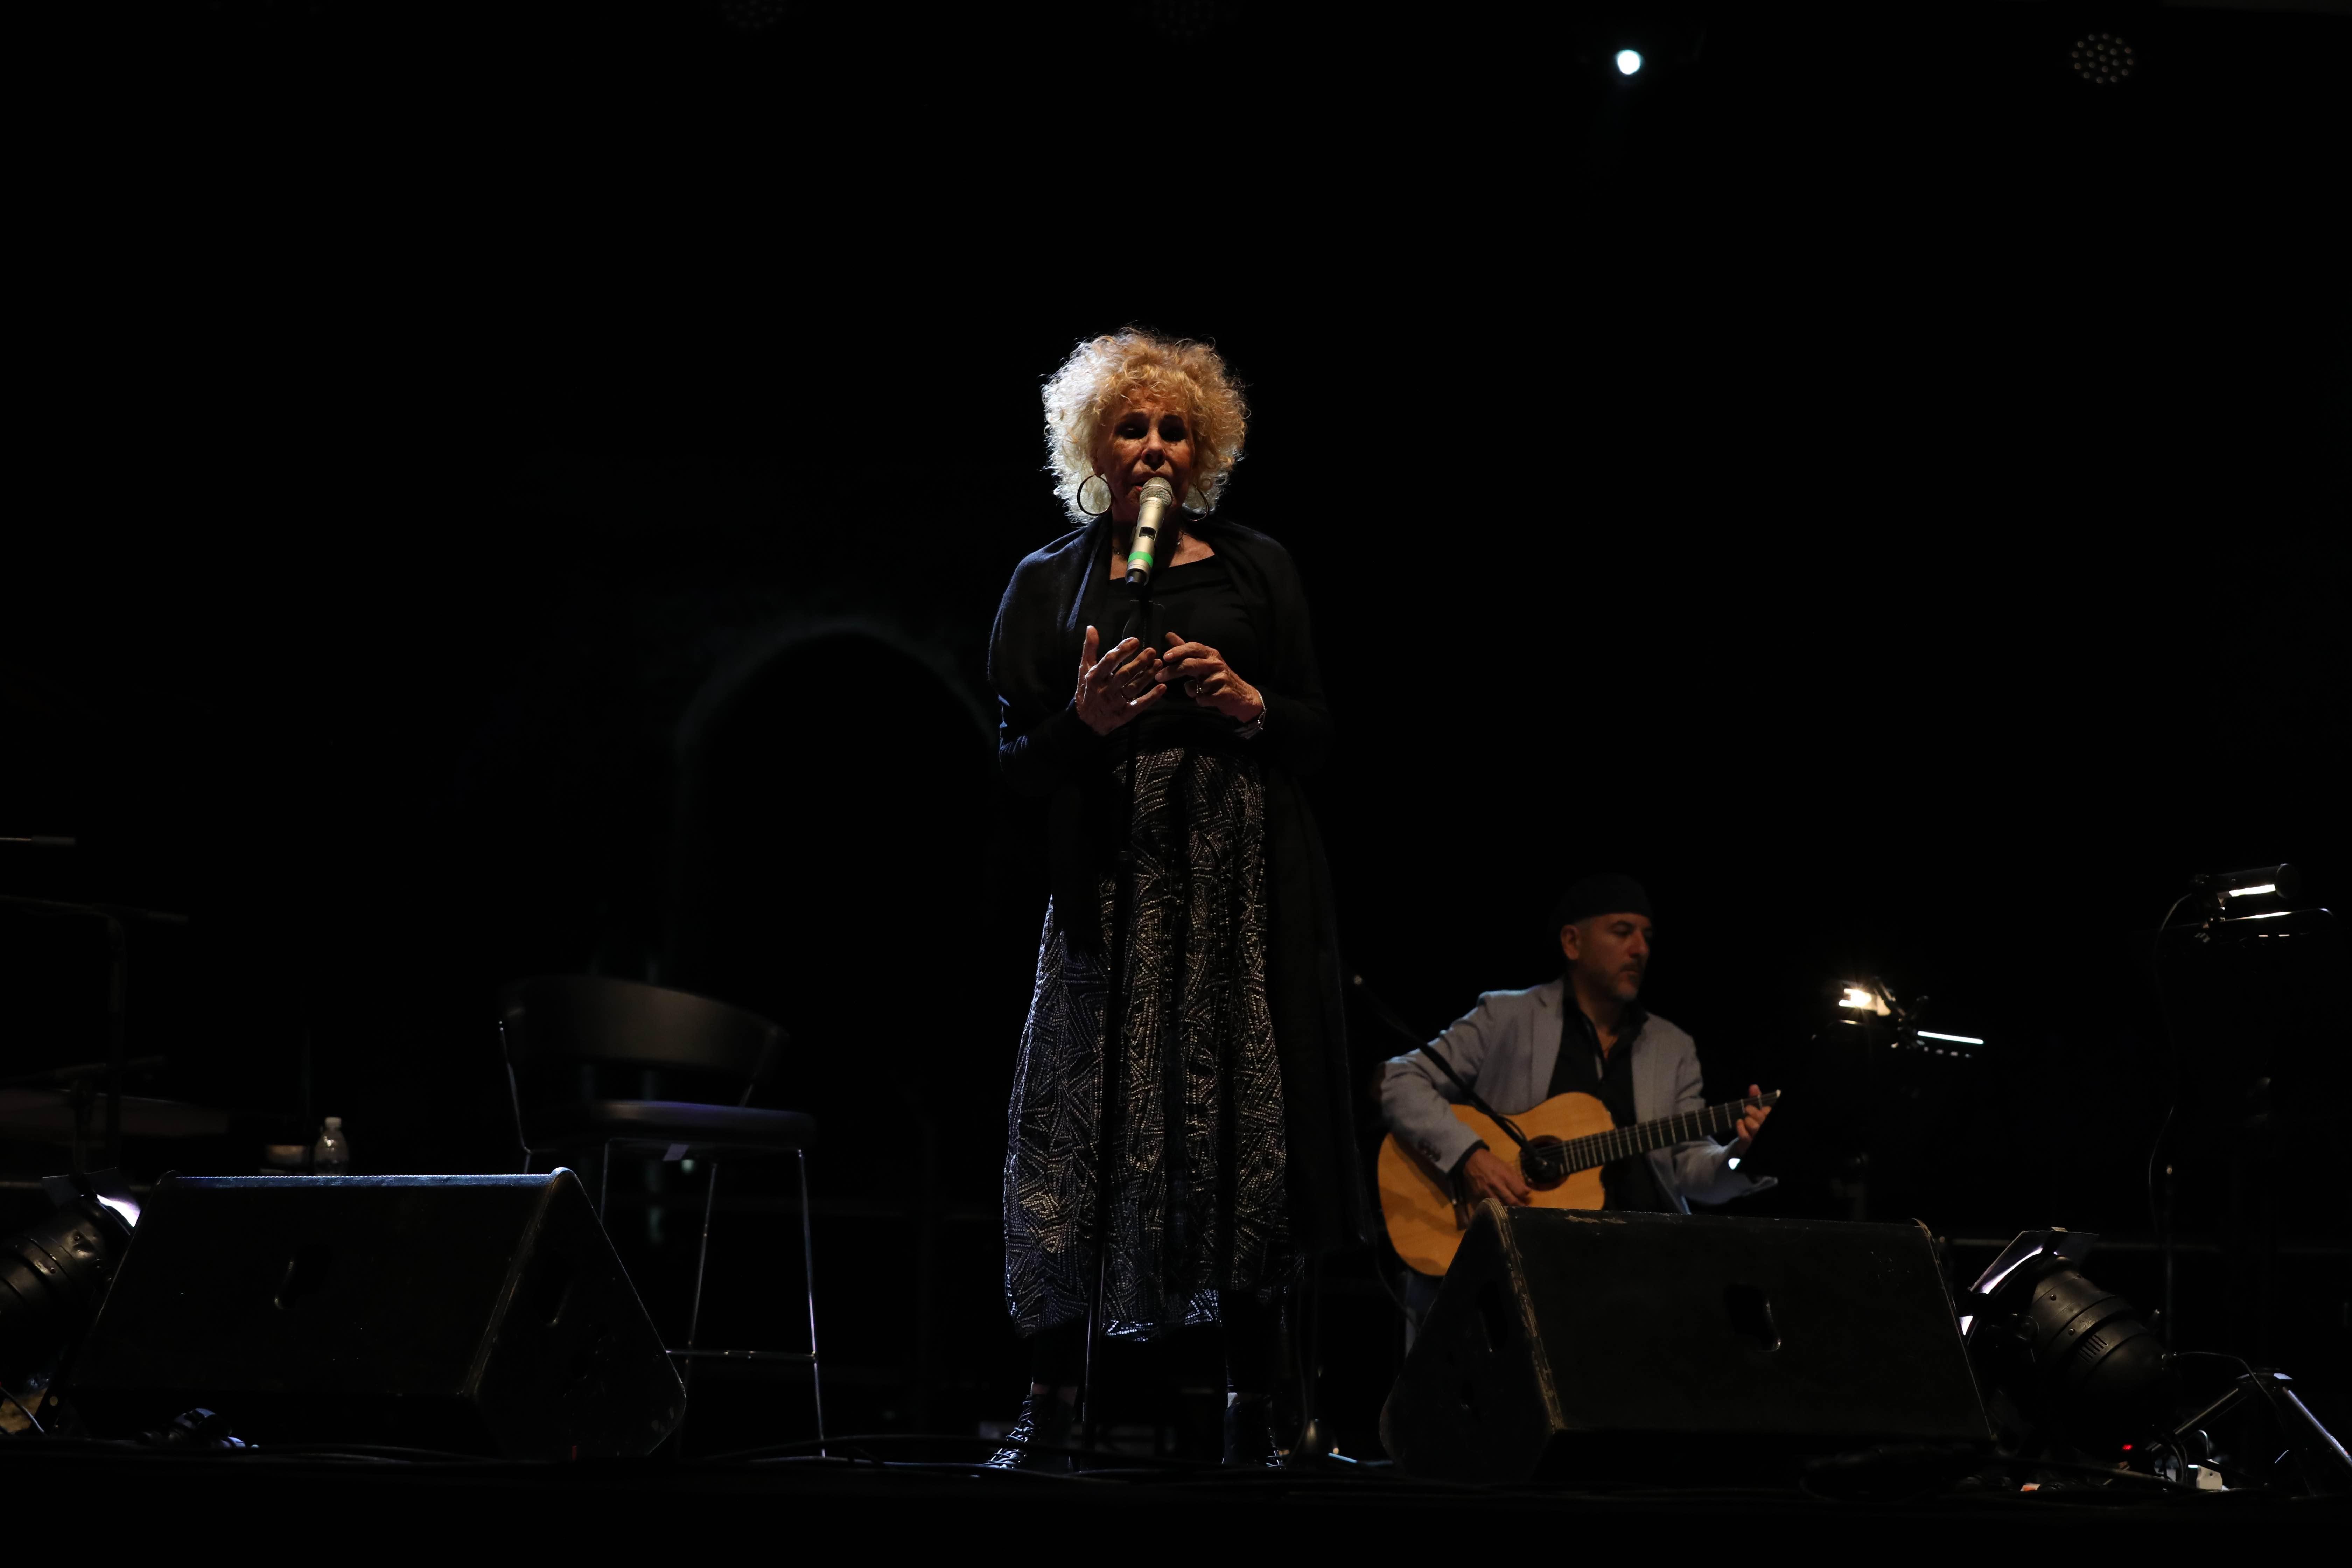 Ornella Vanoni - Pomigliano Jazz Festival ph Anna Vilardi